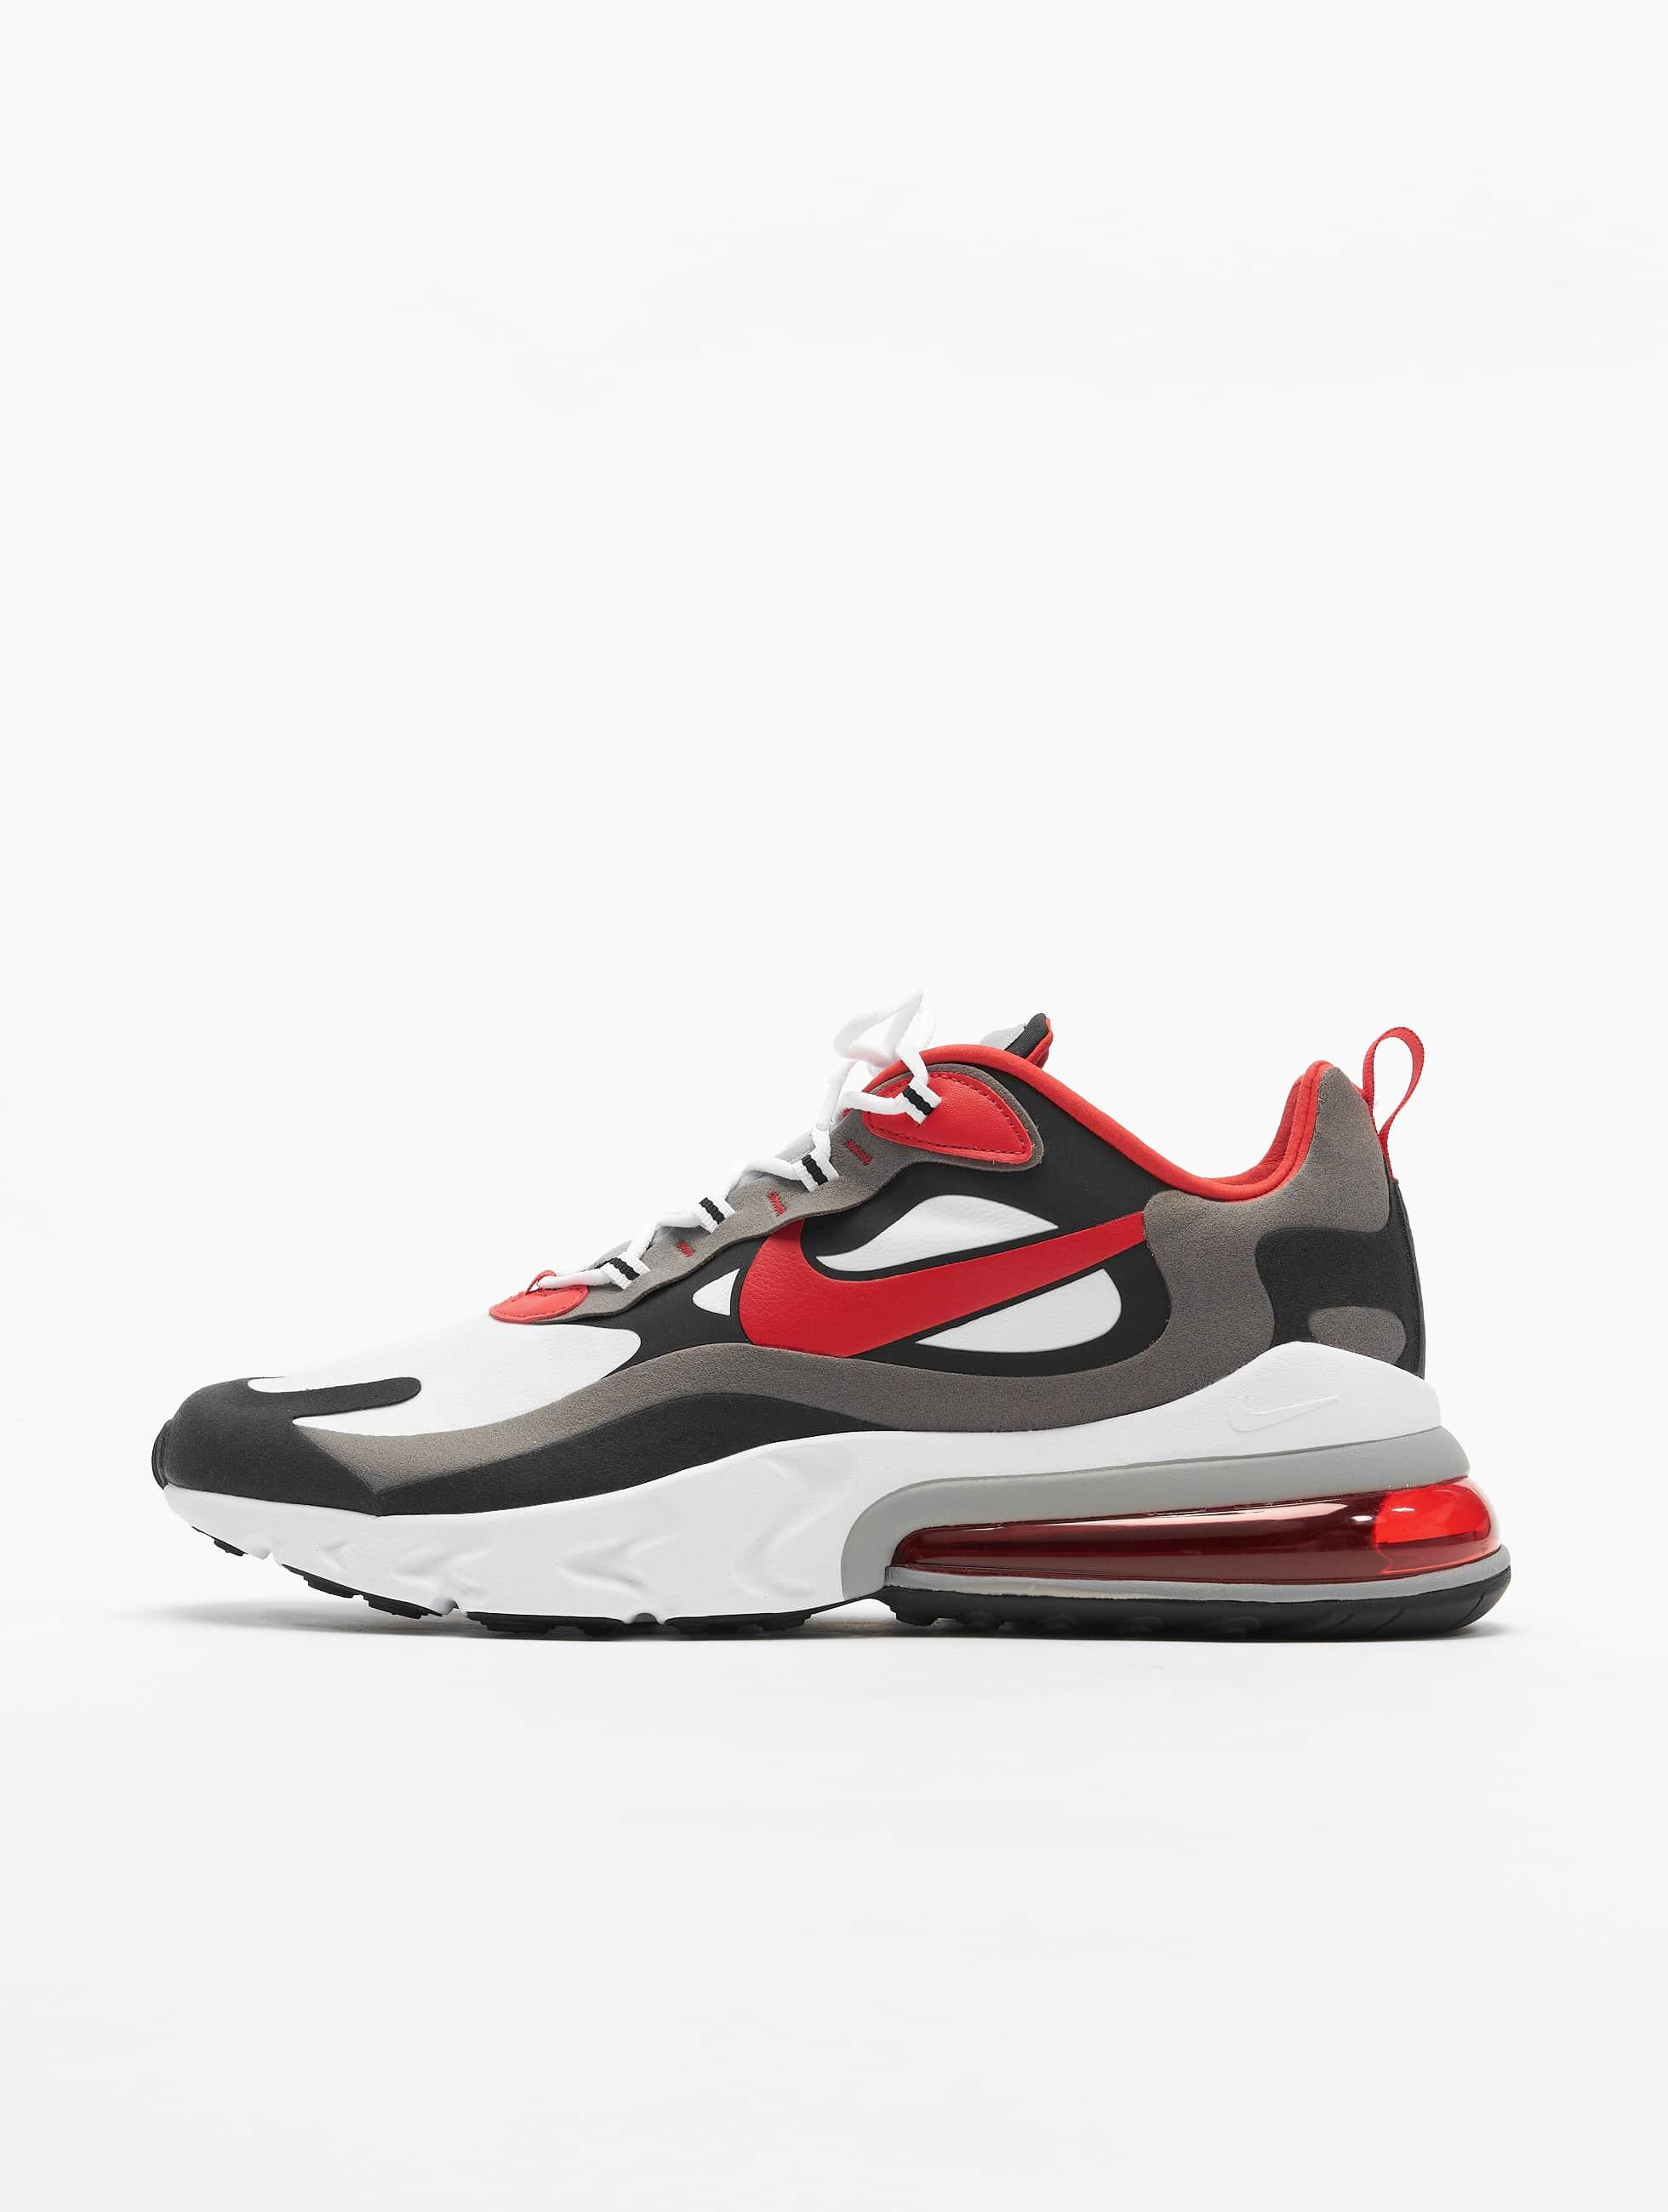 Nike Air Max 270 Herre Sko Mørkblå Sort Rød Outlet Nike